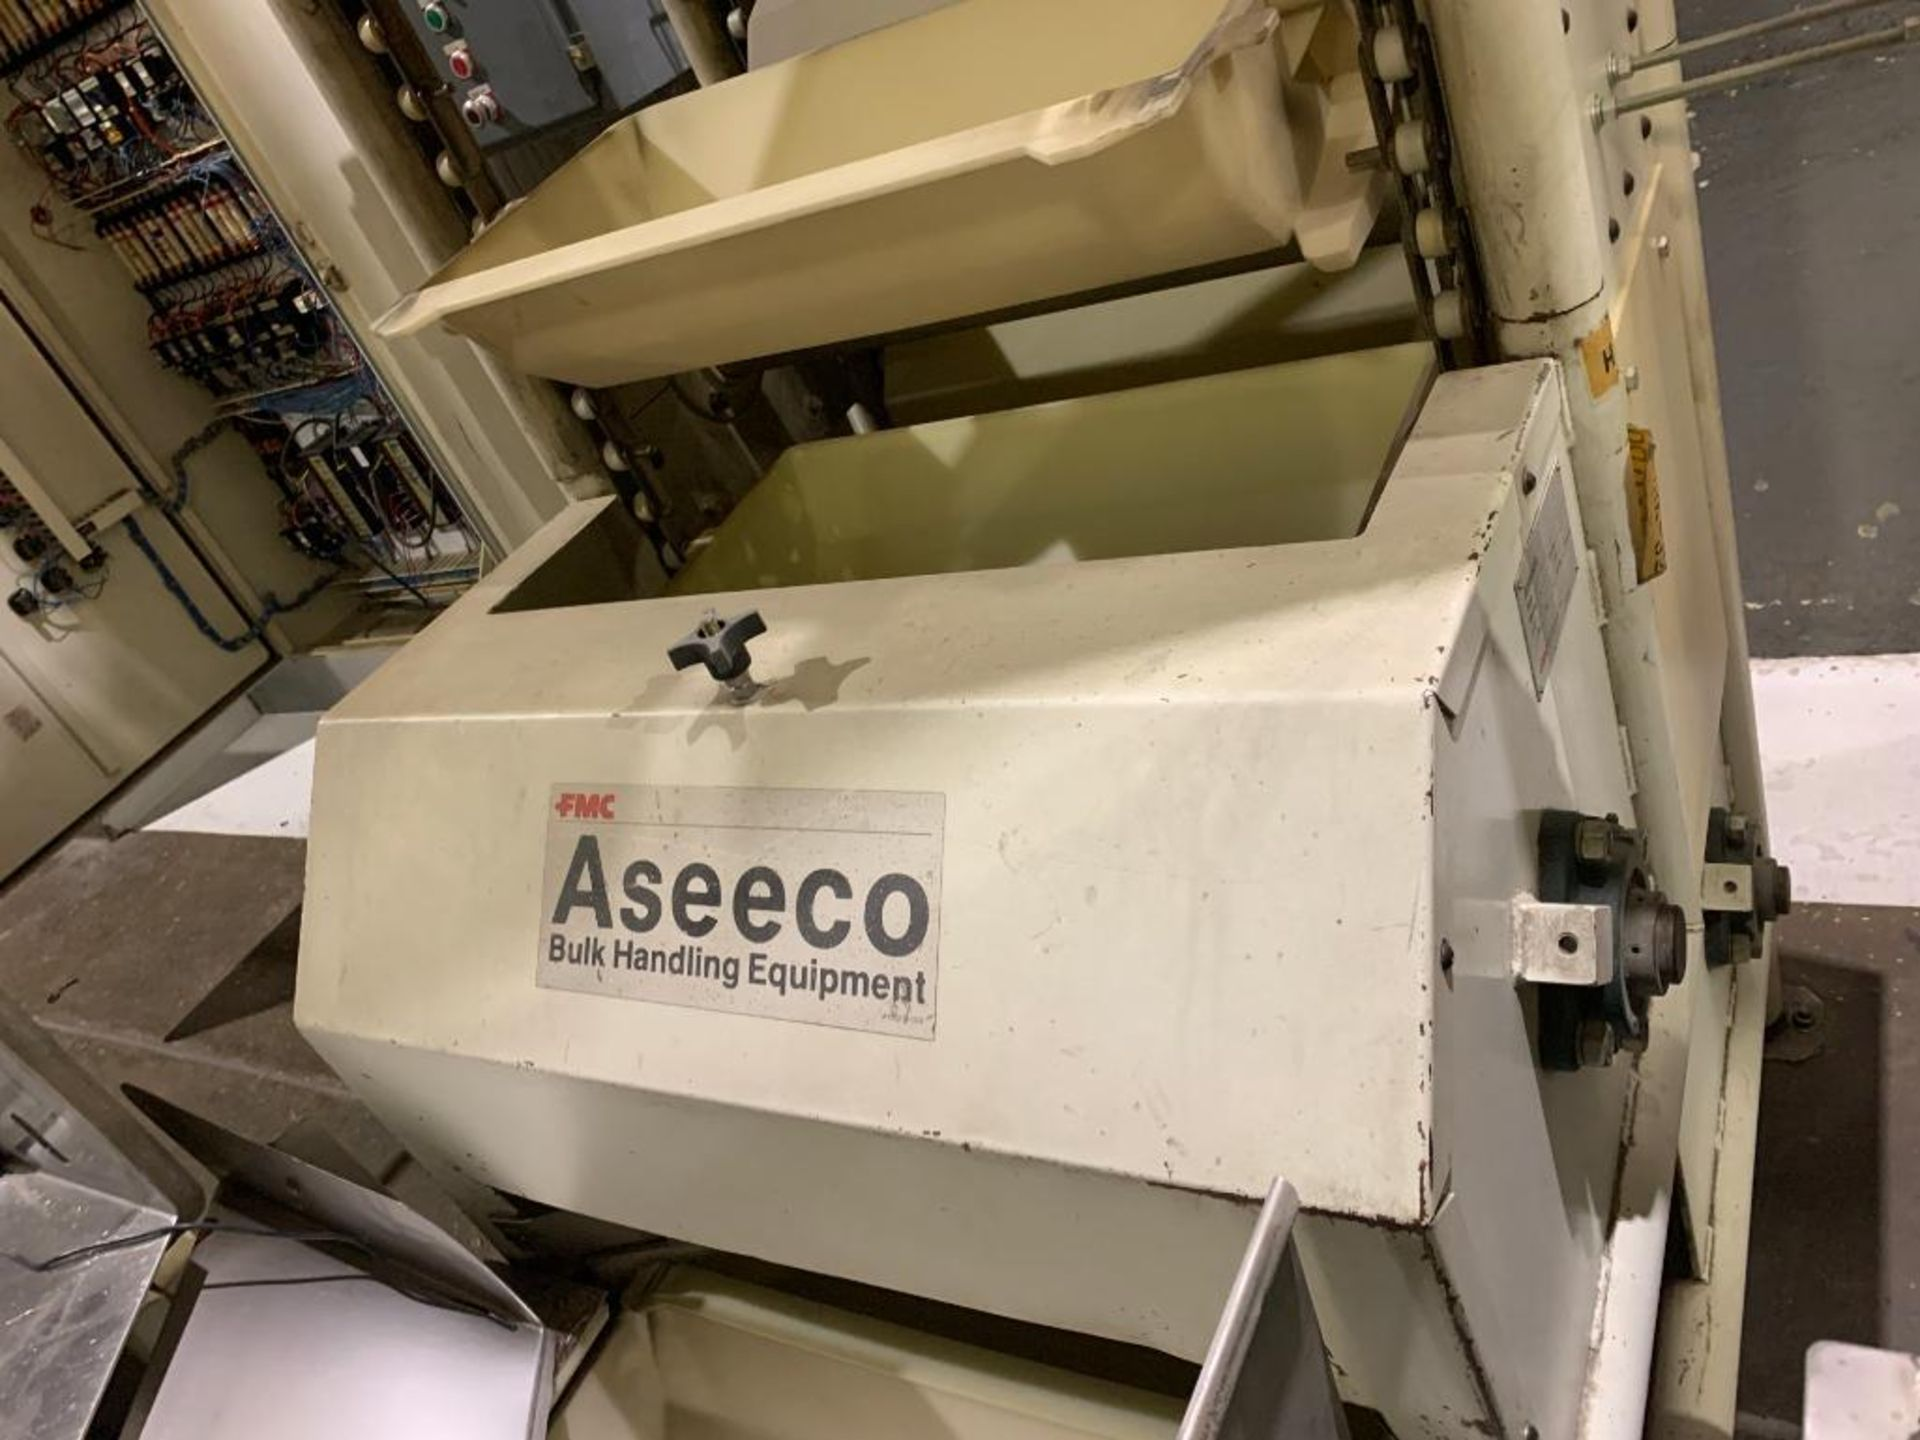 1990 Aseeco horizontal bucket elevator, model ALH-0-24 - Image 9 of 16